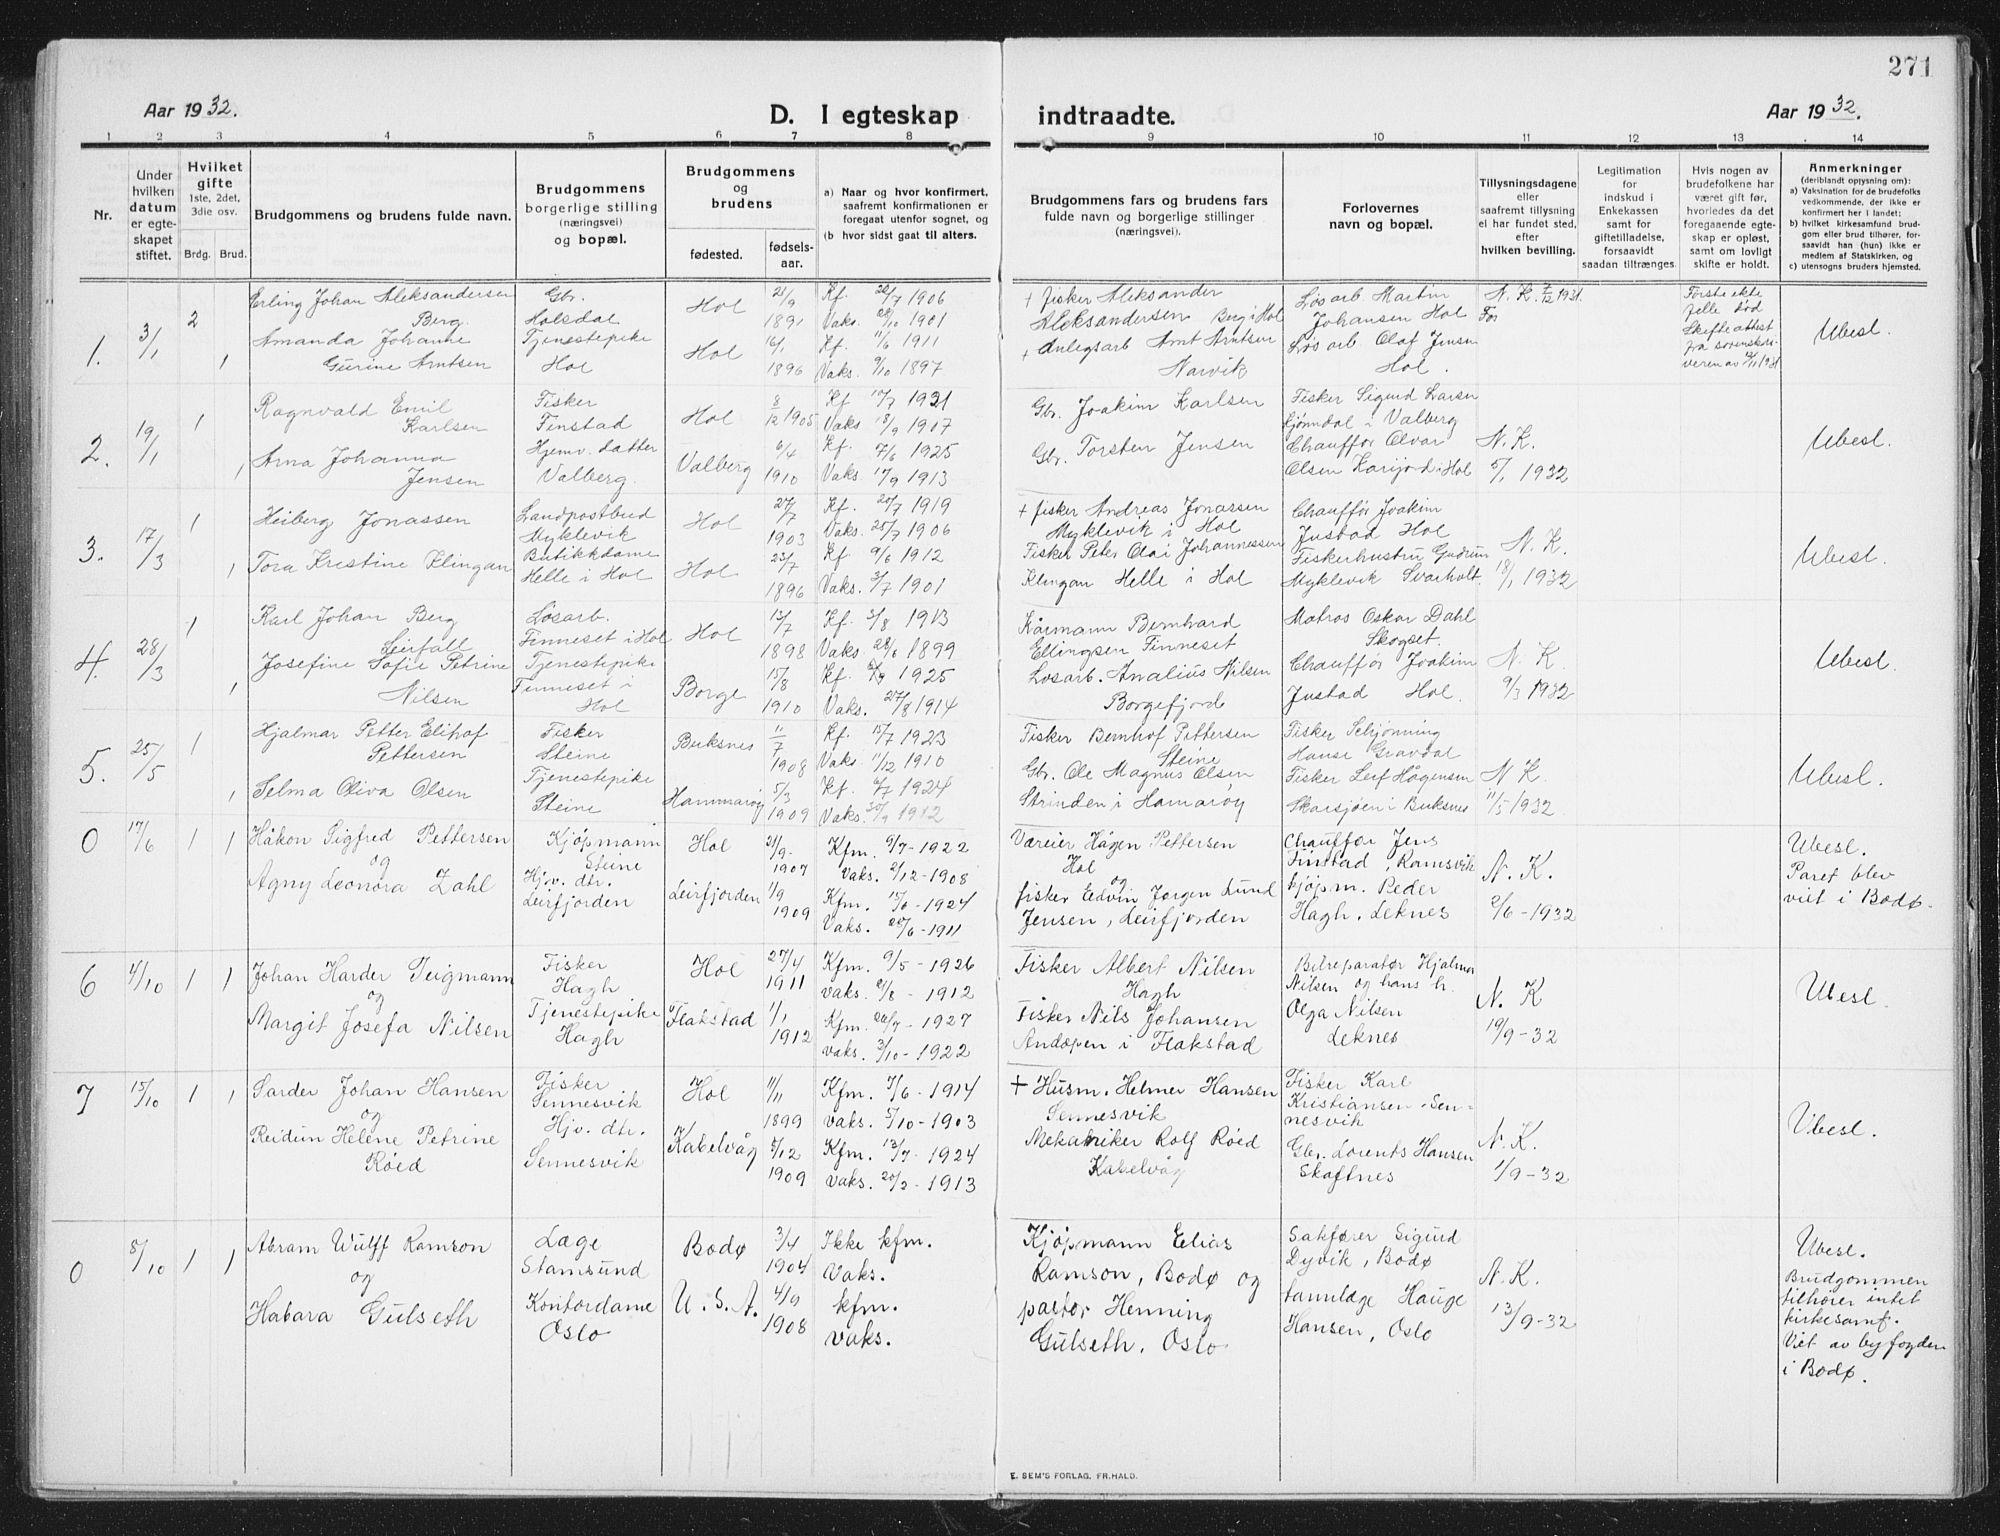 SAT, Ministerialprotokoller, klokkerbøker og fødselsregistre - Nordland, 882/L1183: Klokkerbok nr. 882C01, 1911-1938, s. 271